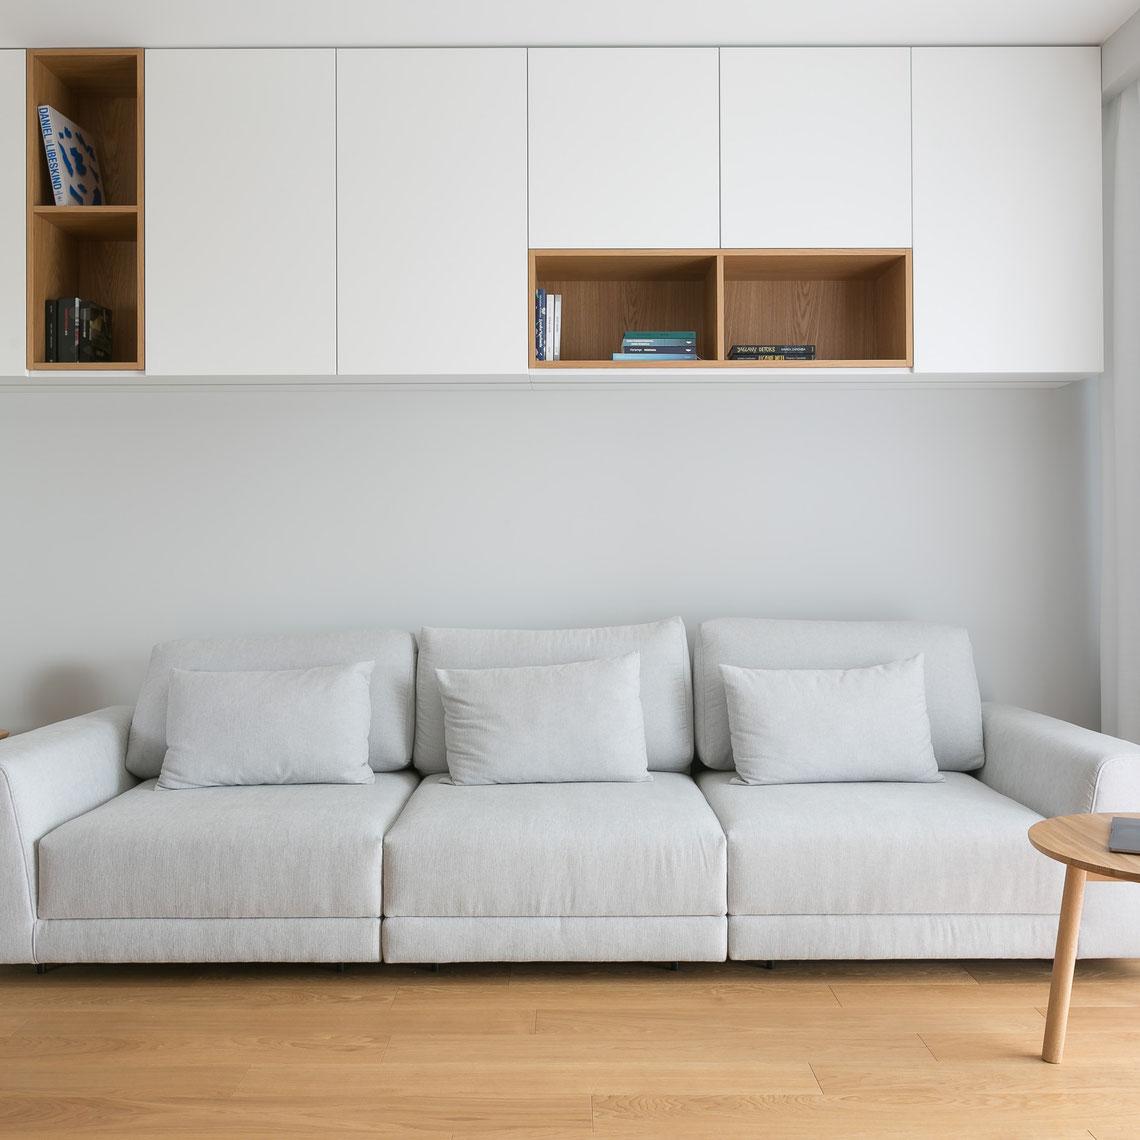 projekt salonu, sofa rozkładana